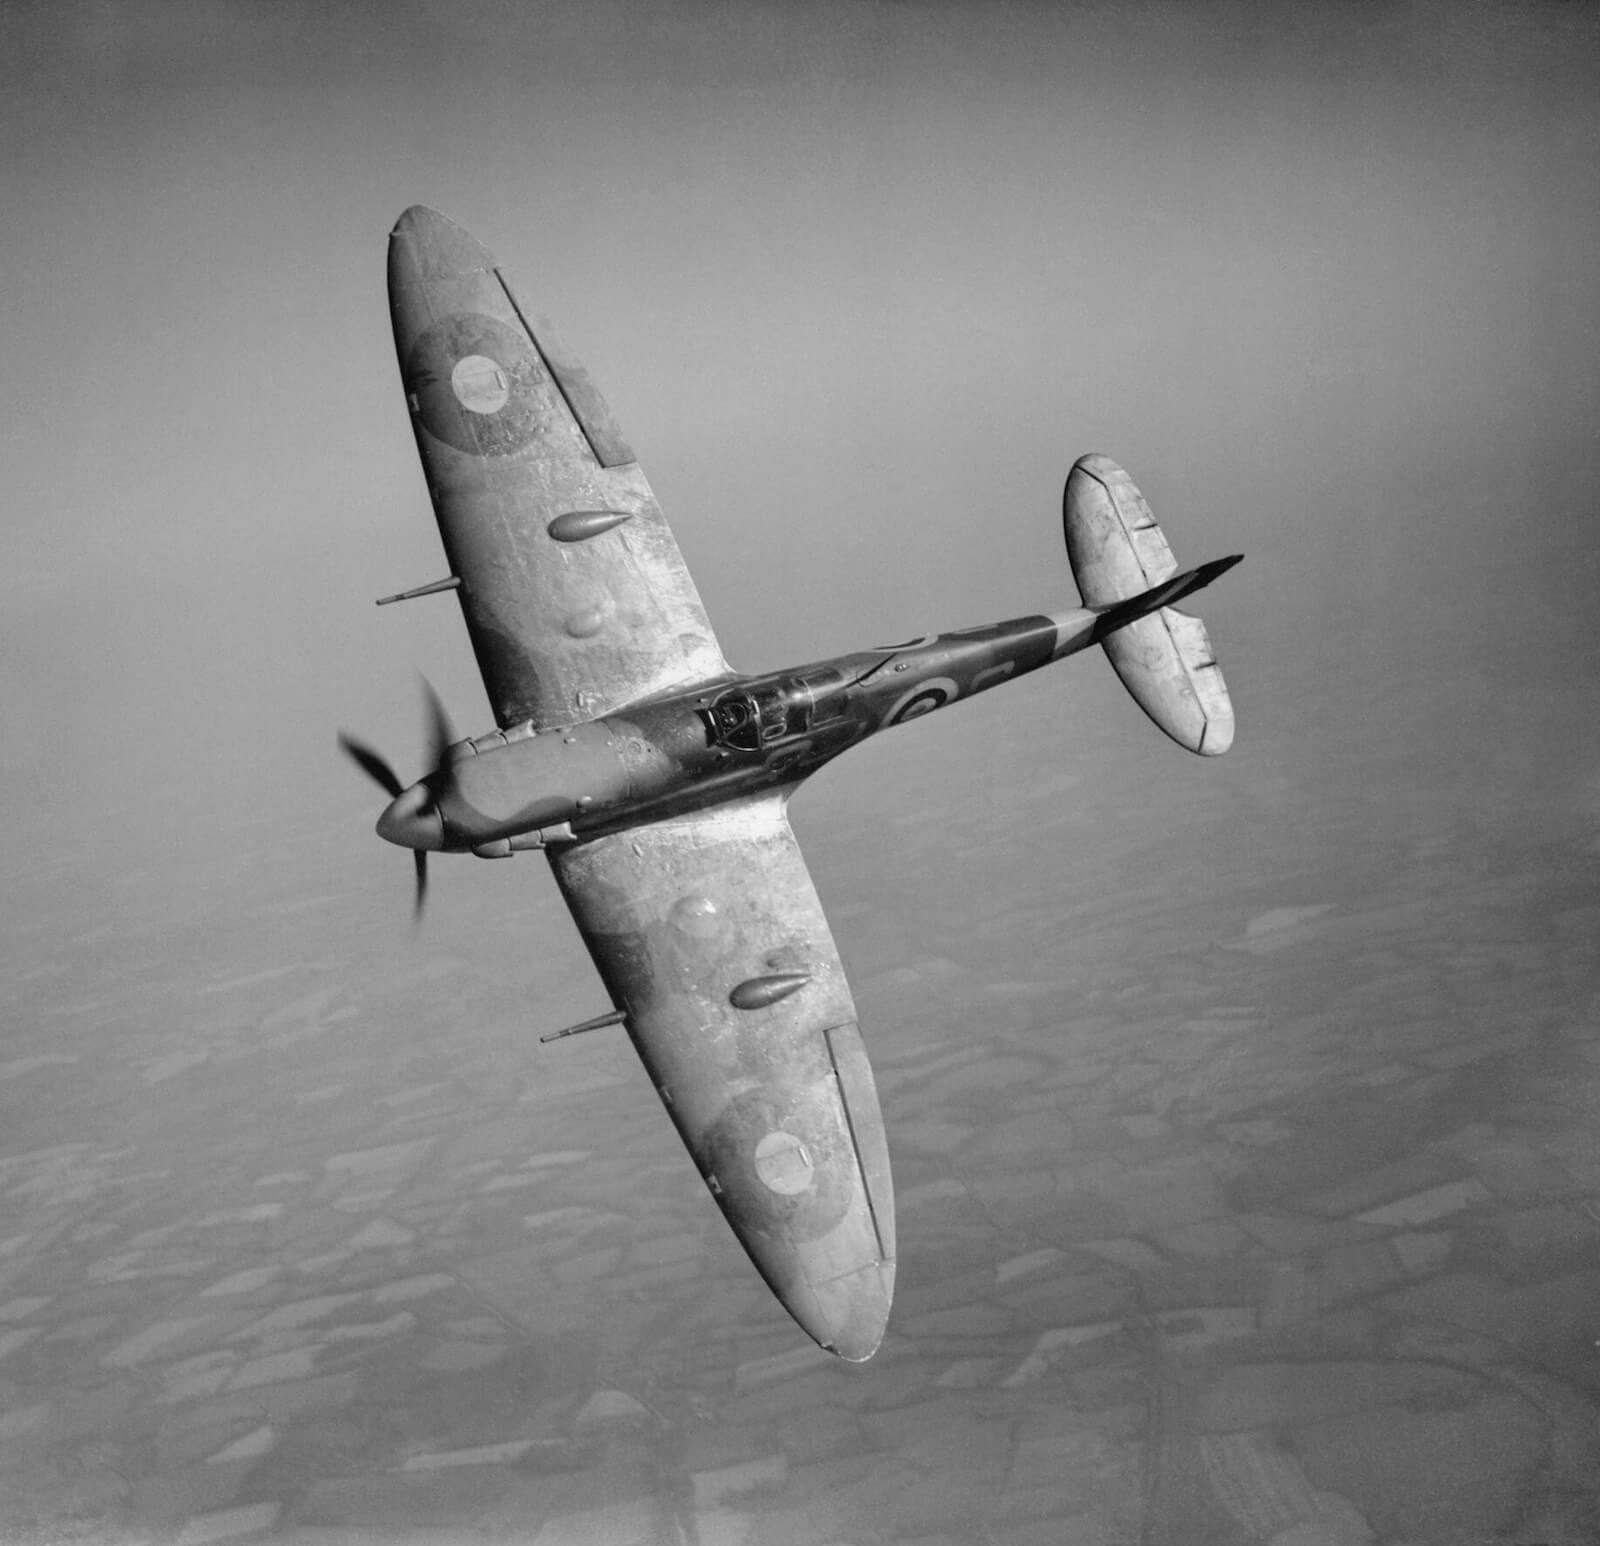 Supermarine Spitfire Mk Vb mitos batalla de Inglaterra